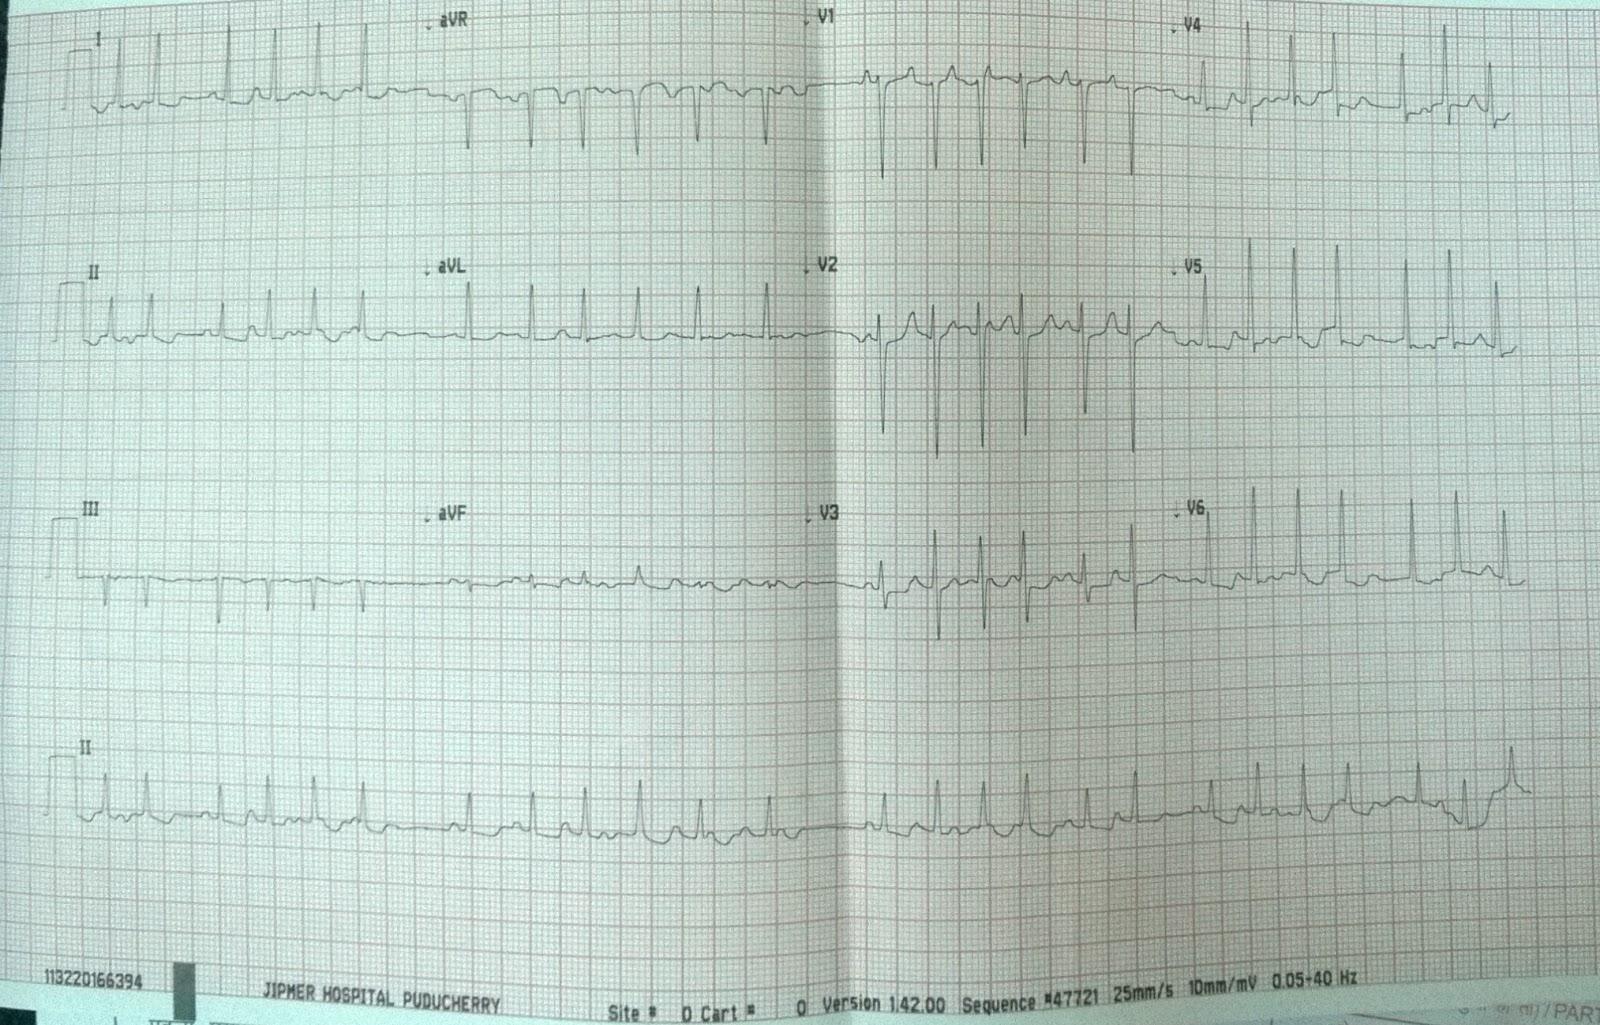 Cardiology window: Atrial tachycardia